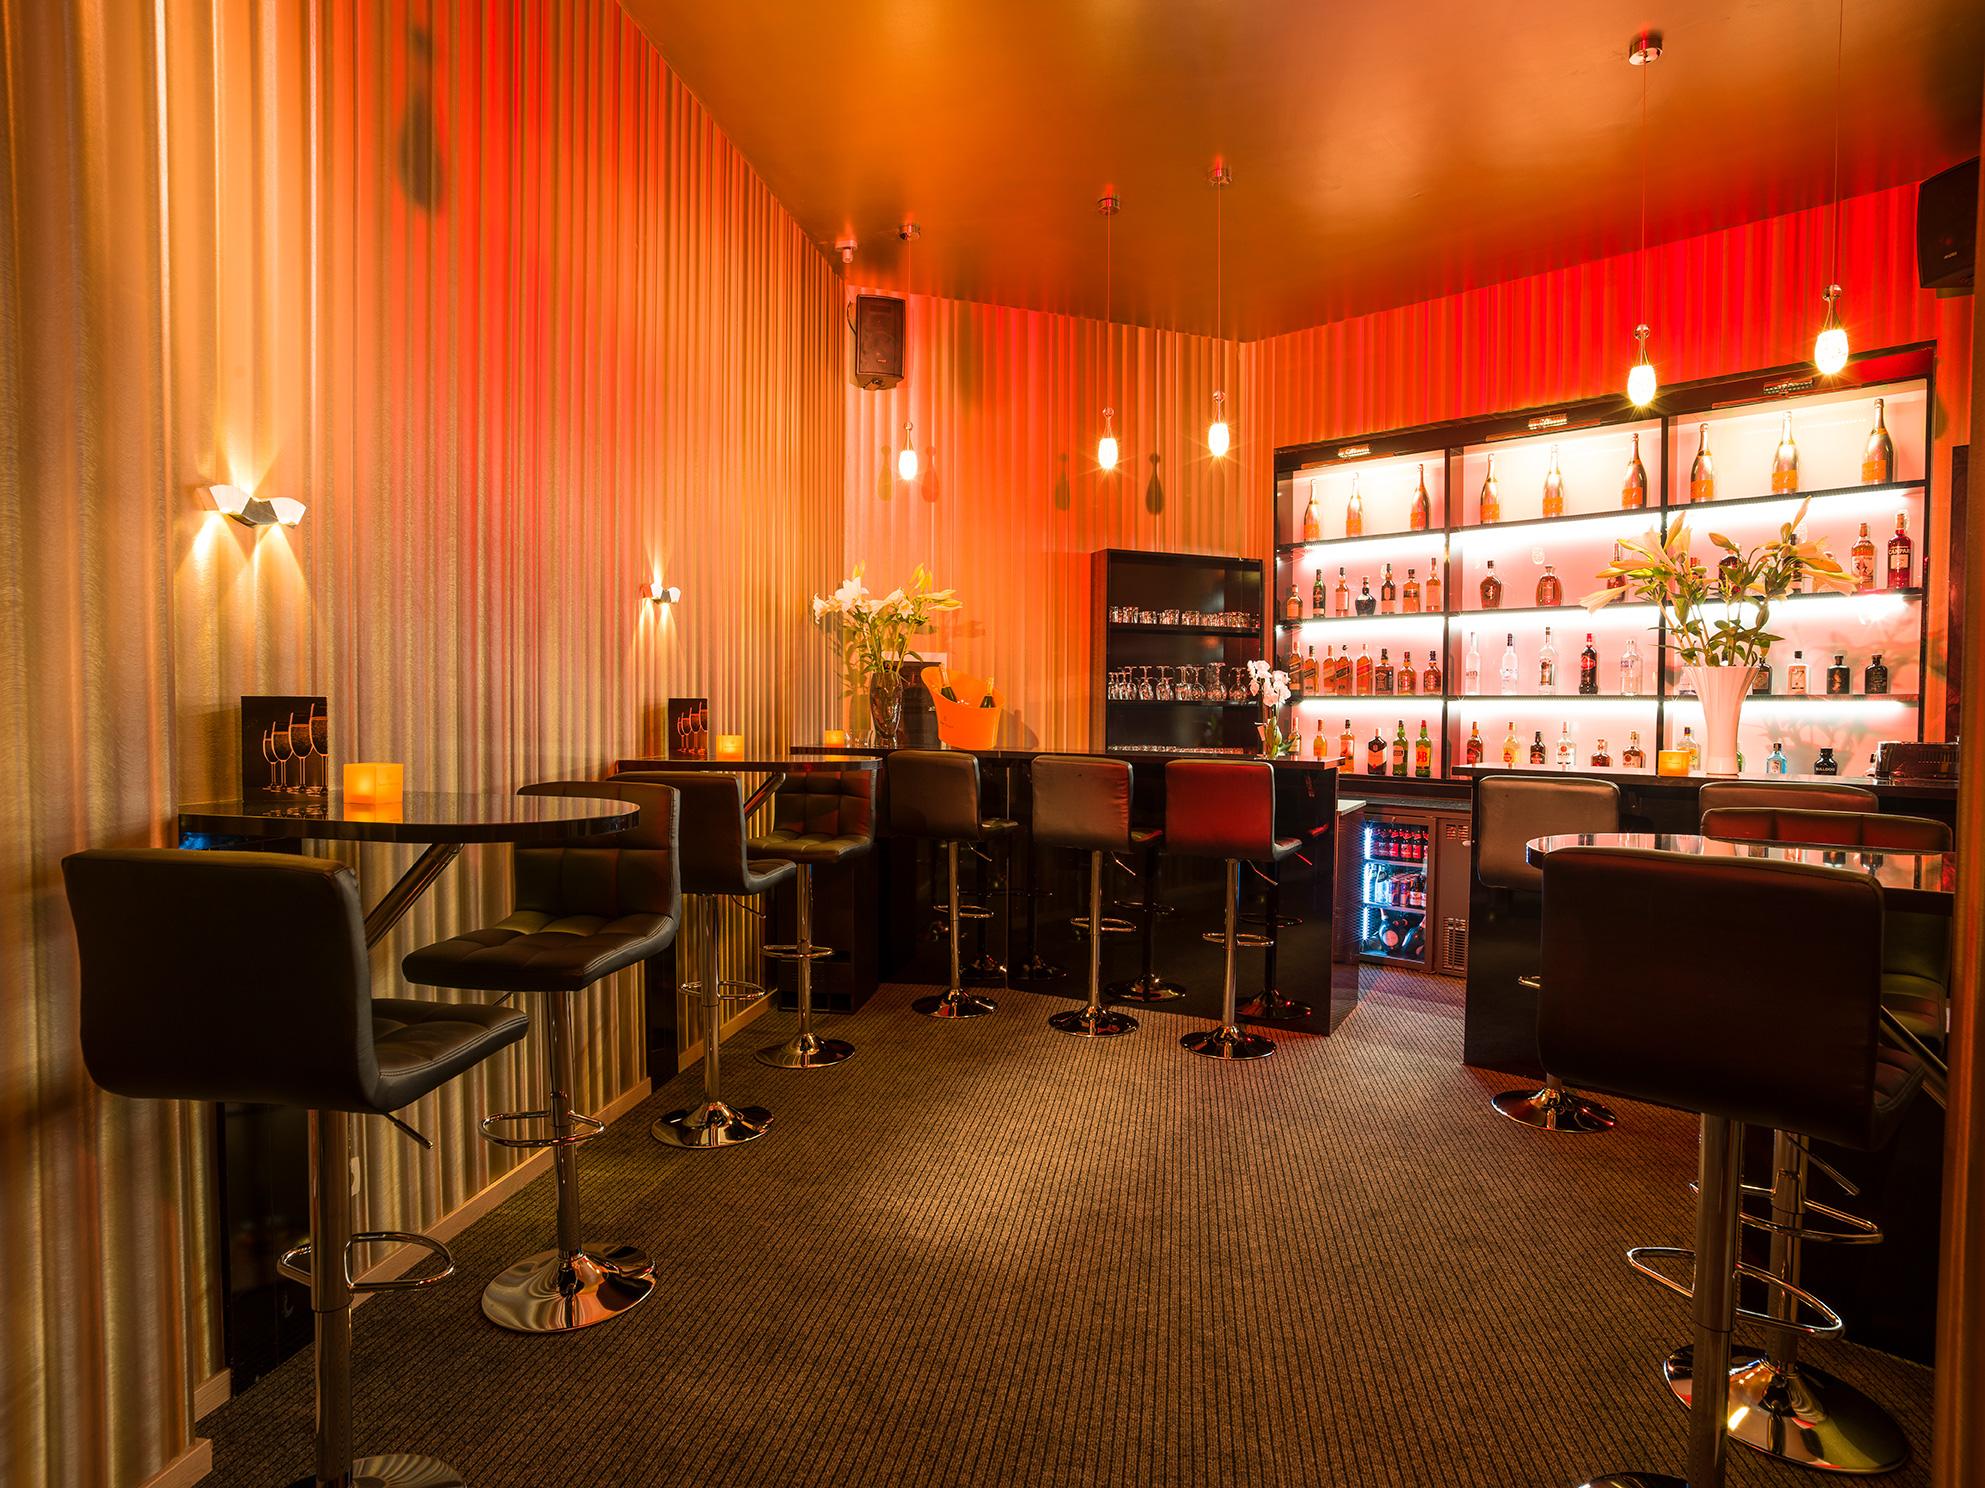 Champagne & Liquor bar